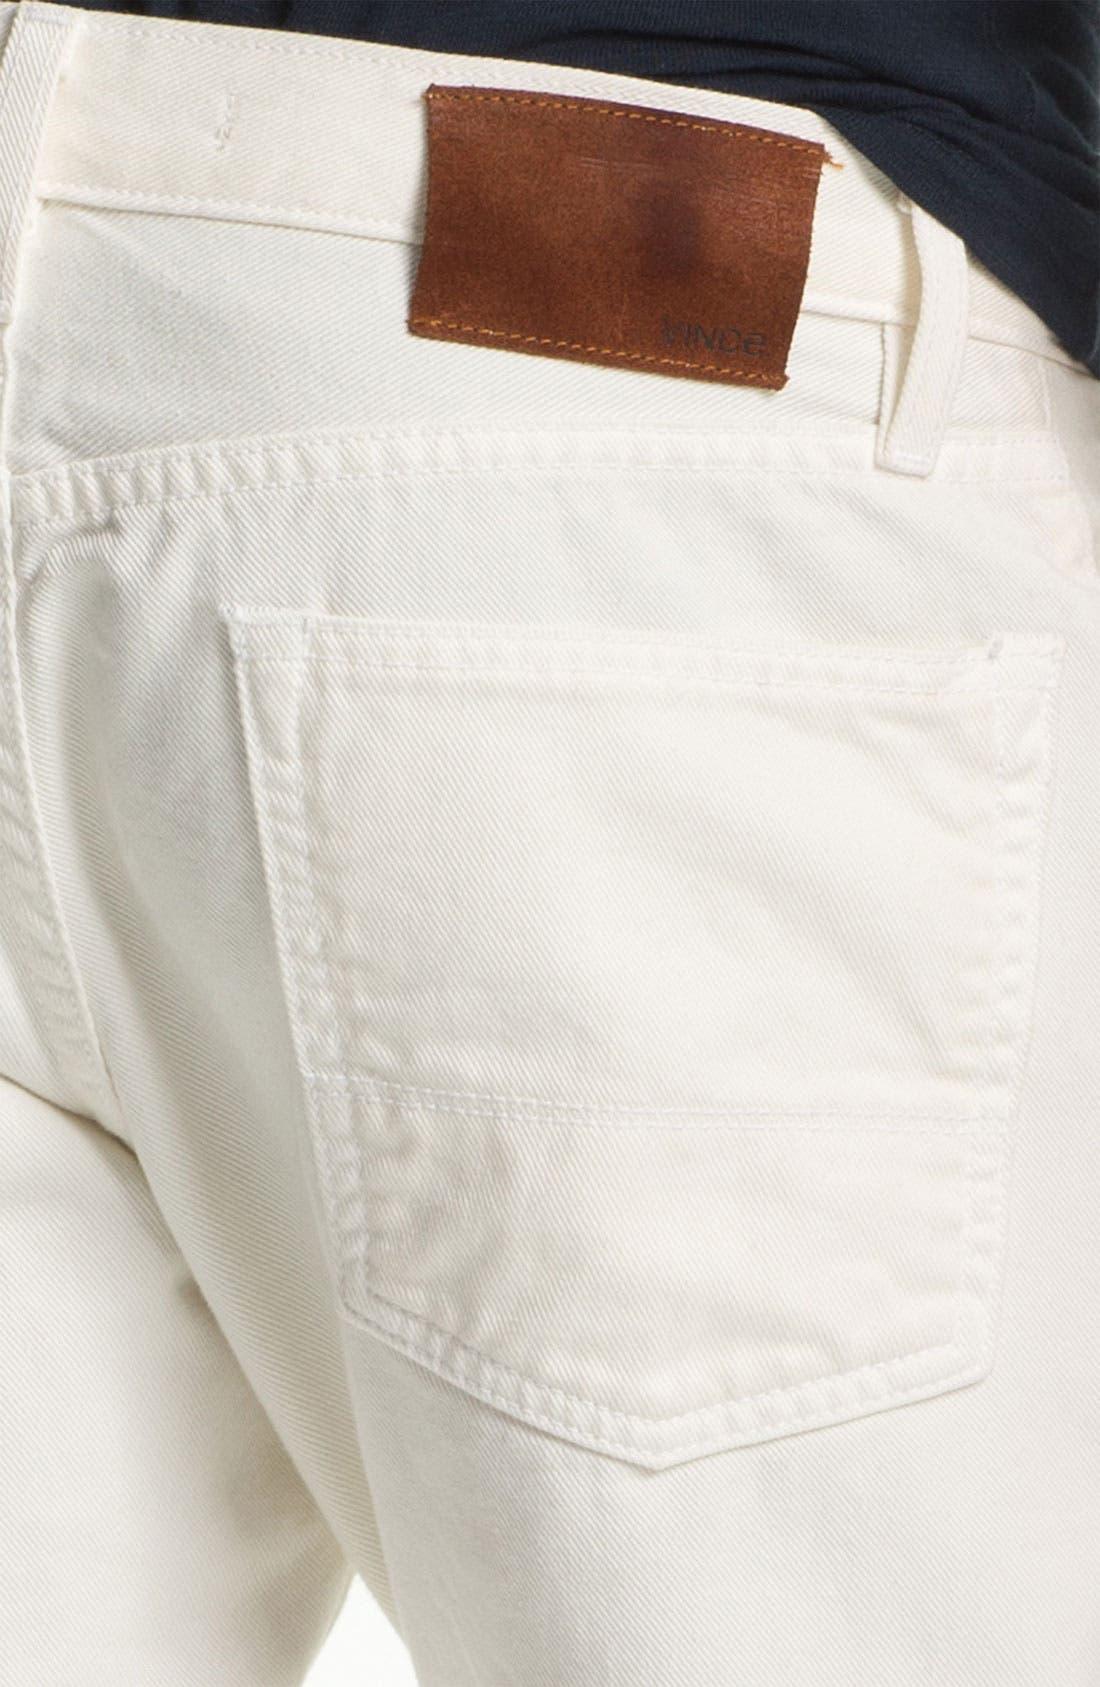 Straight Leg Five Pocket Pants,                             Alternate thumbnail 3, color,                             115